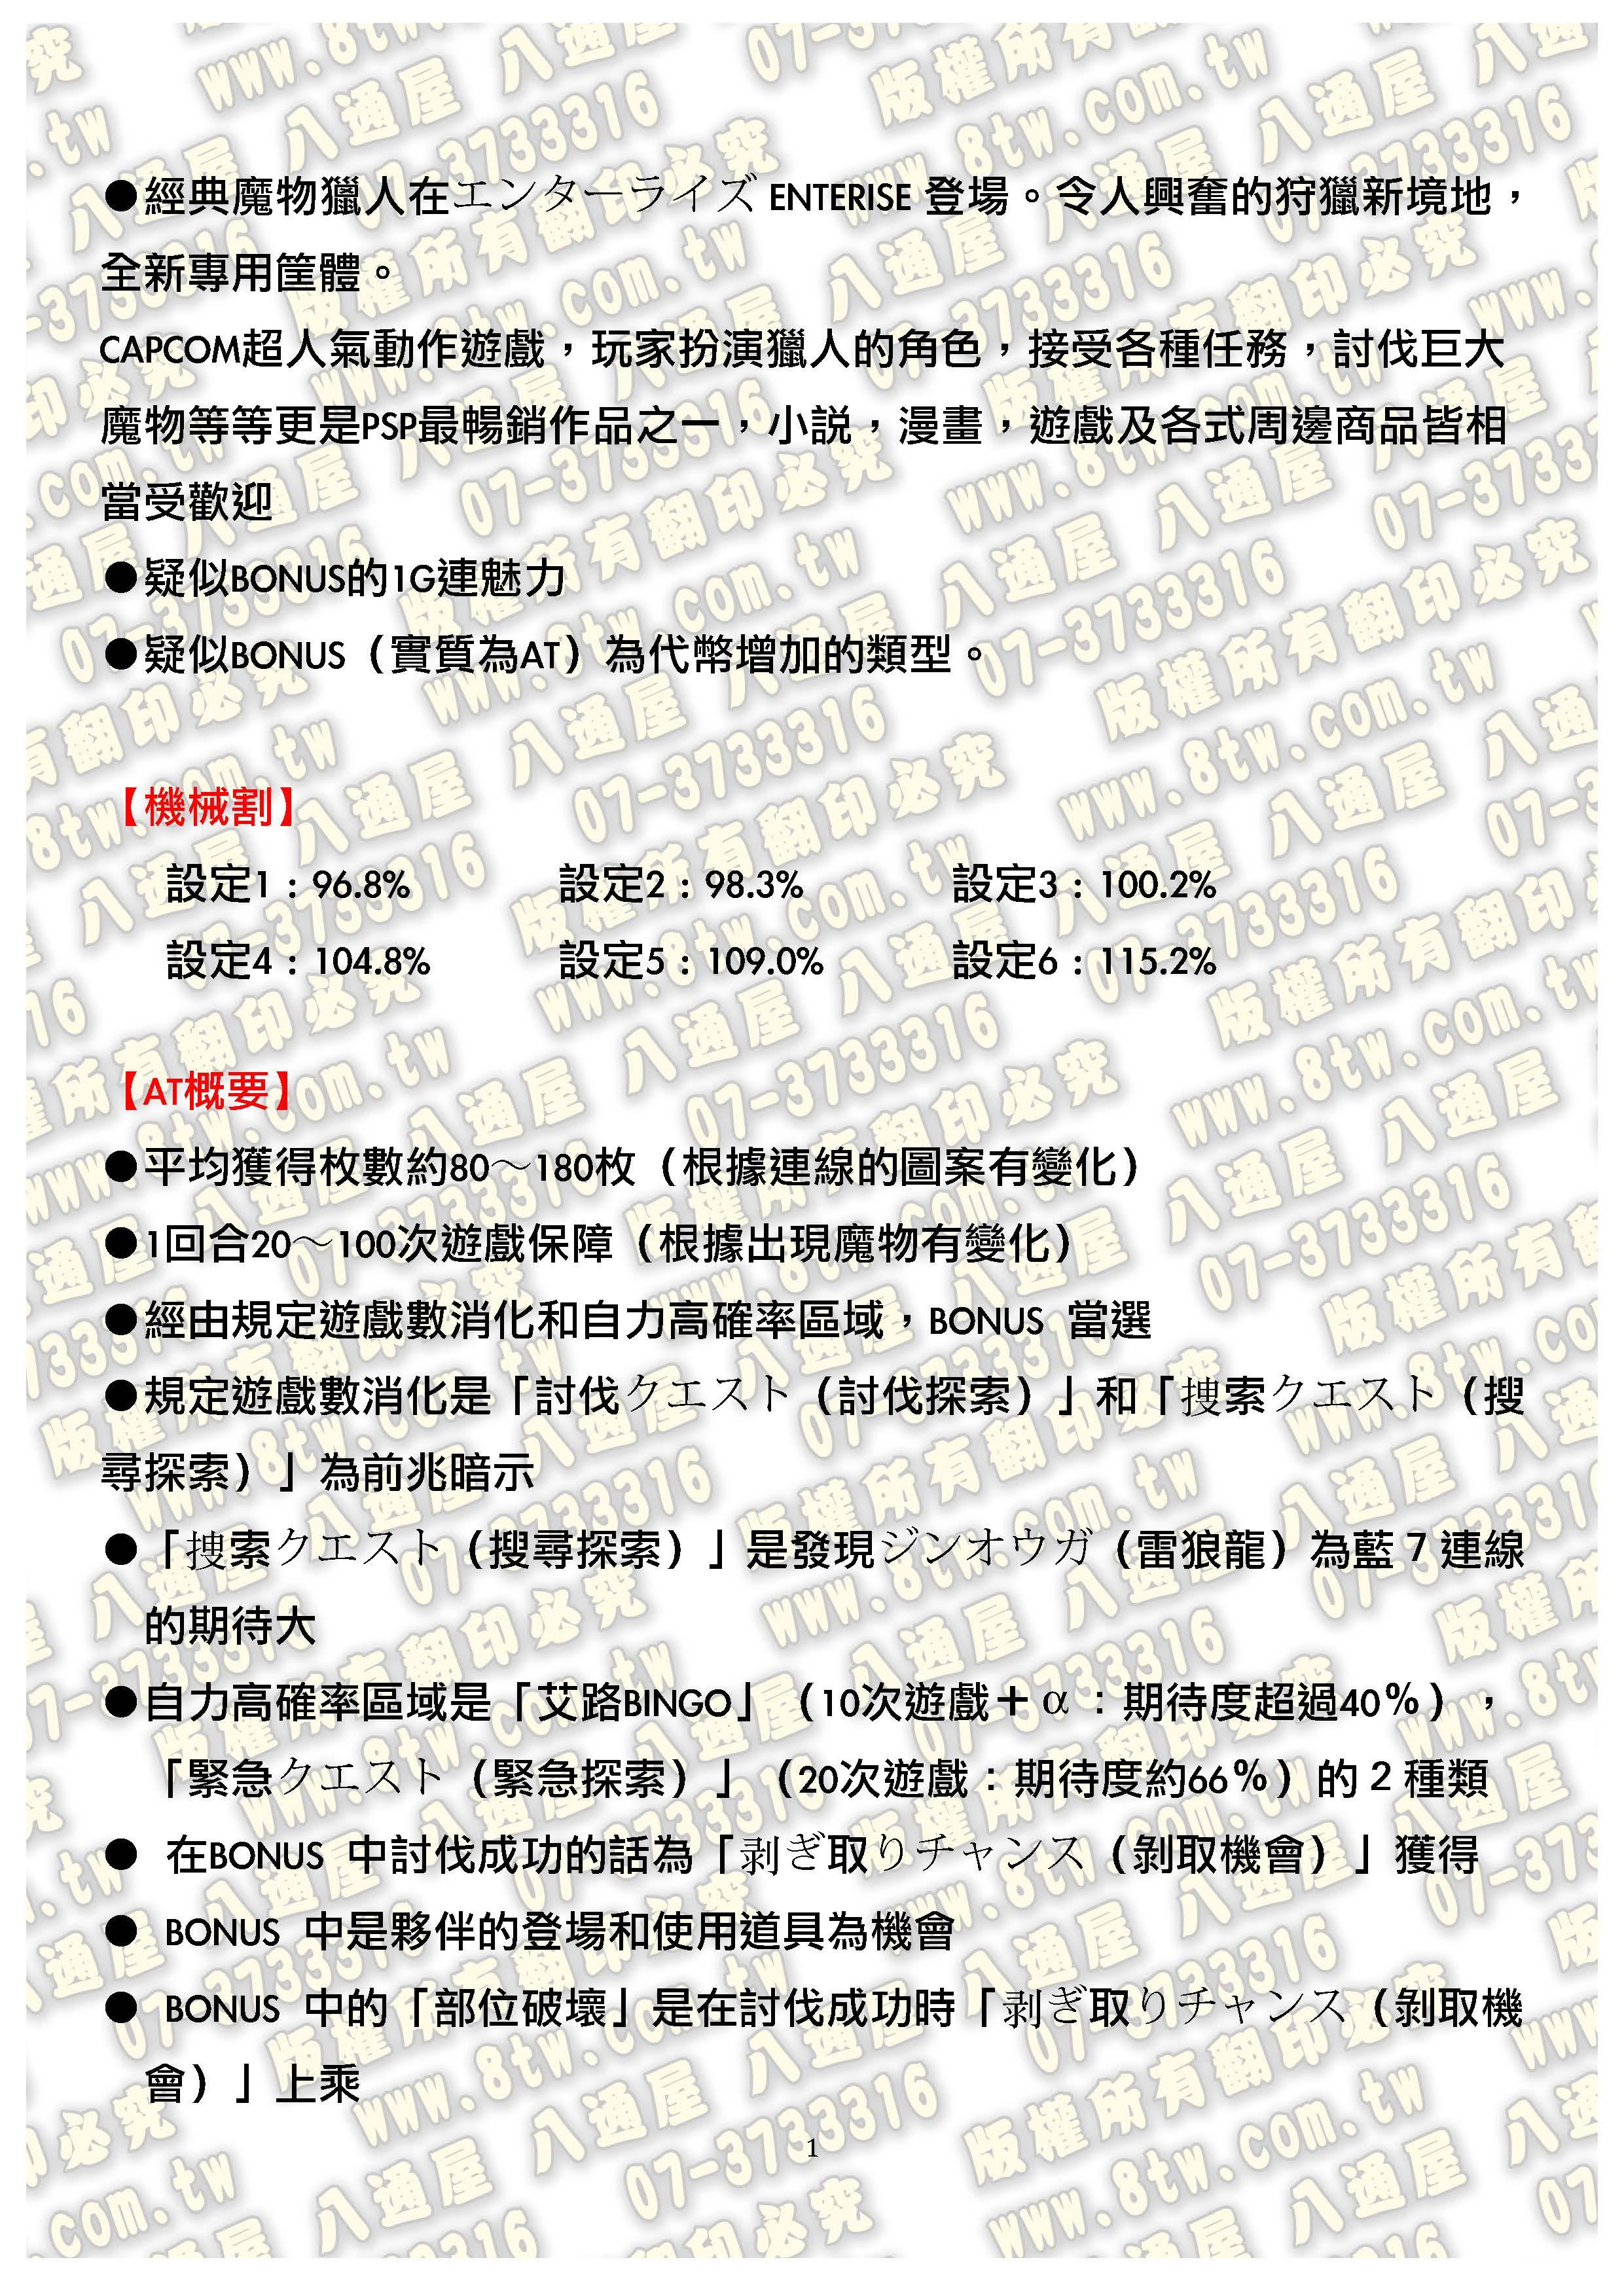 S0202魔物獵人 月下雷鳴 中文版攻略_Page_02